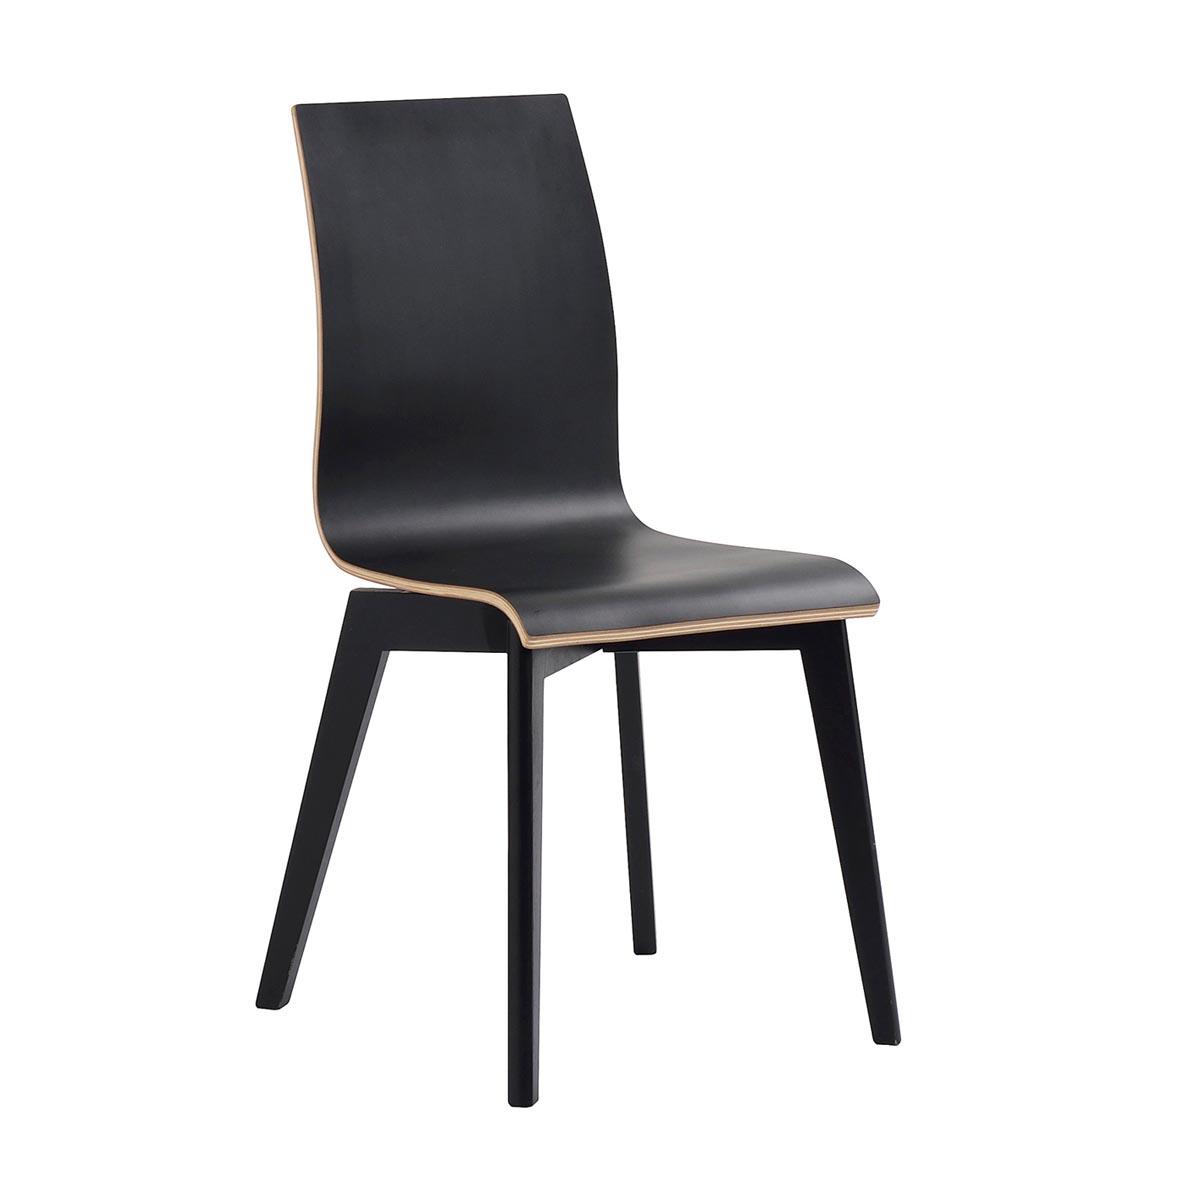 Febe-stol-svart-laminat-svart-Grace-113631